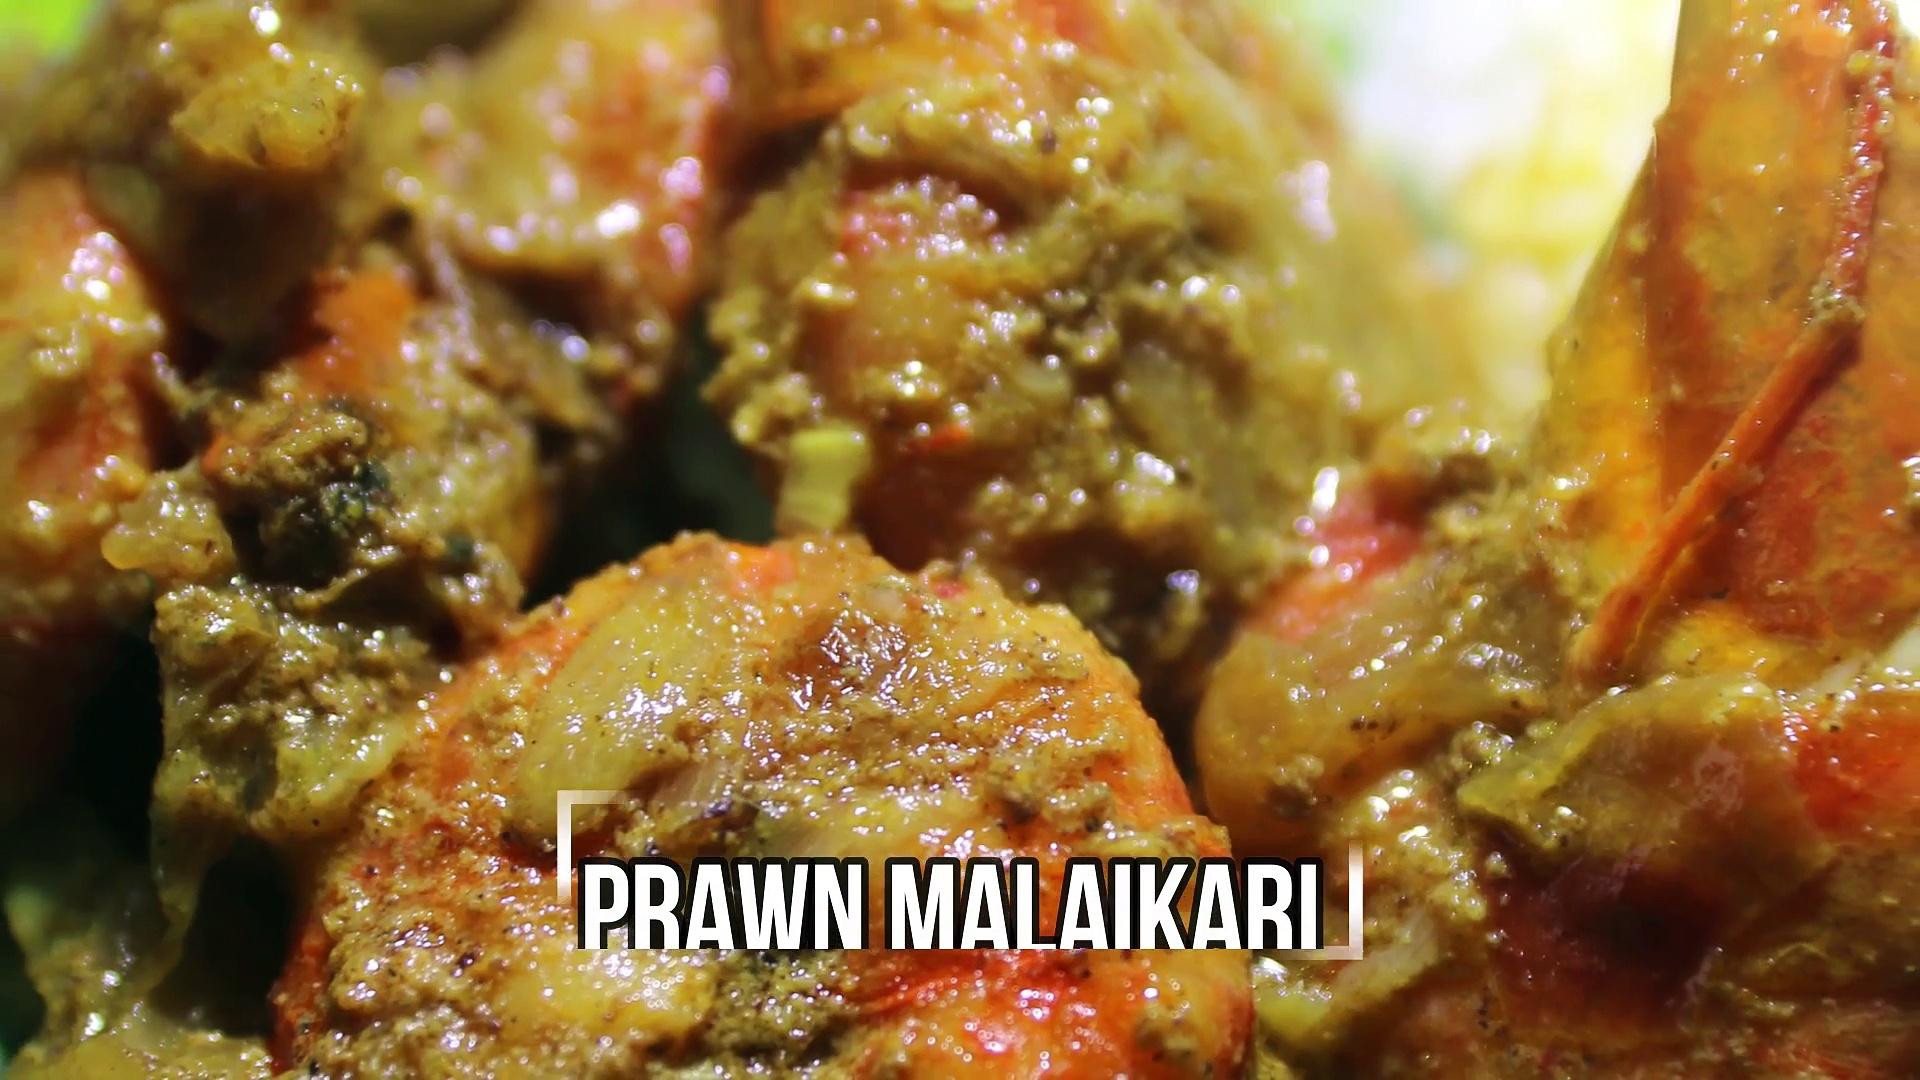 How to Cook Prawn Malaikari | Recipe of Prawn Malaikari | Ricette Malaikari di gamberetti | চিংড়ী মালাইকারি রেসিপি